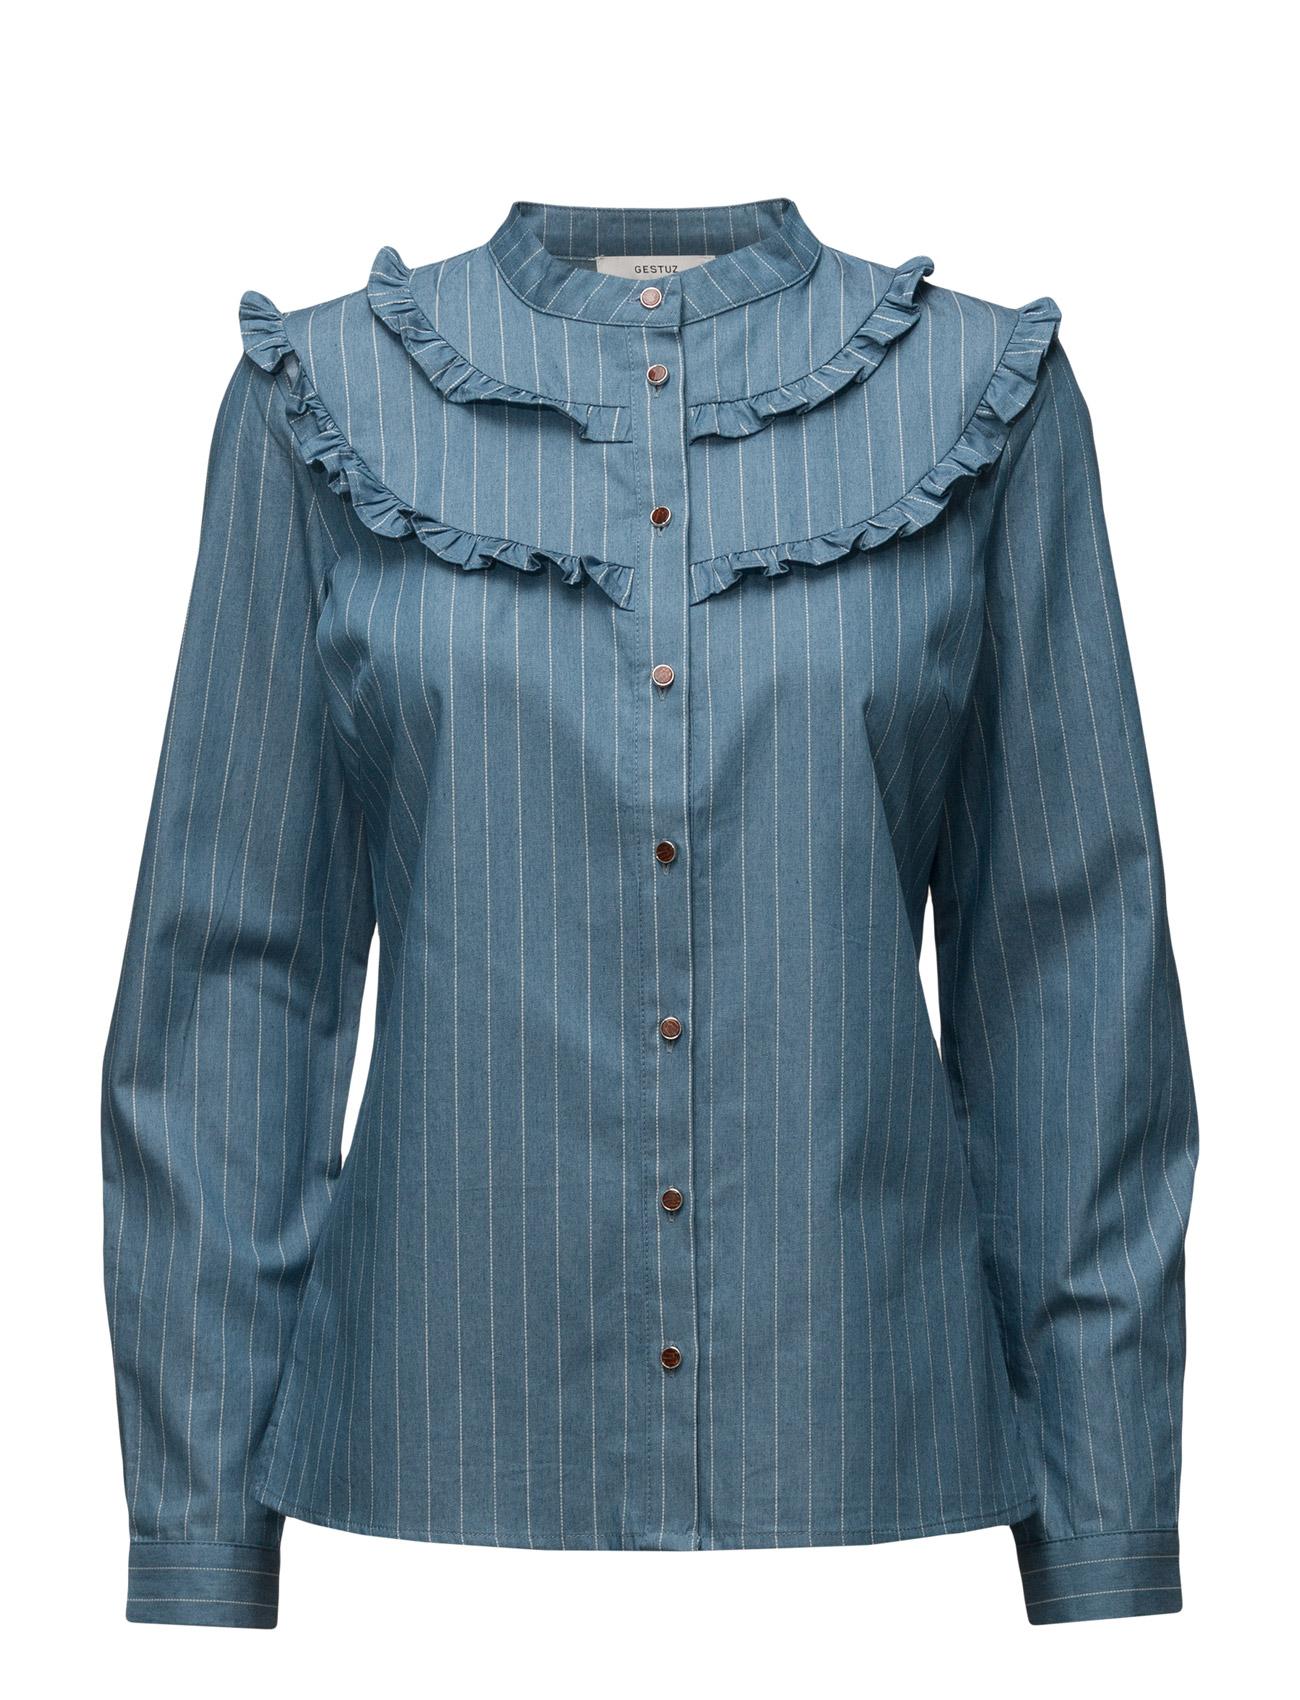 Gestuz Braxton shirt MS17